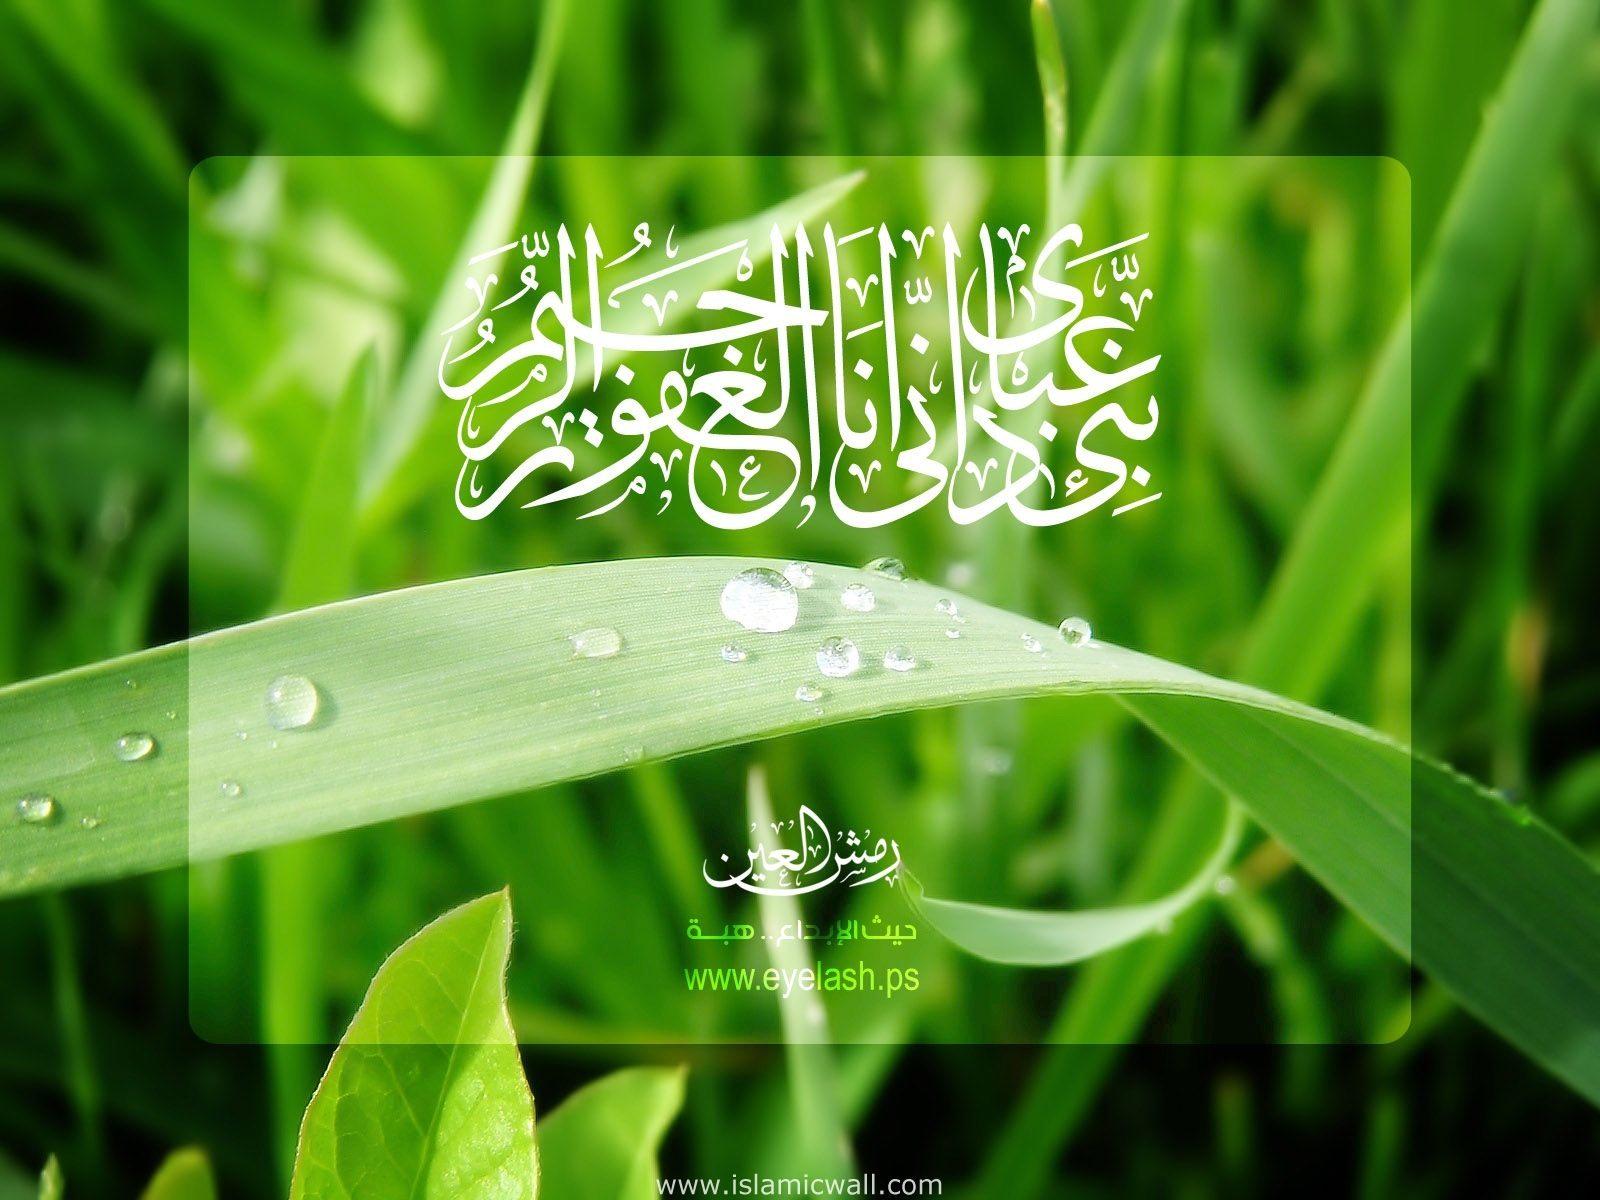 http://www.full-wallpaper.com/informatique/Vista_Islamic/Nabi_Abadi_Ina_Ghaforo_Rahim.jpg